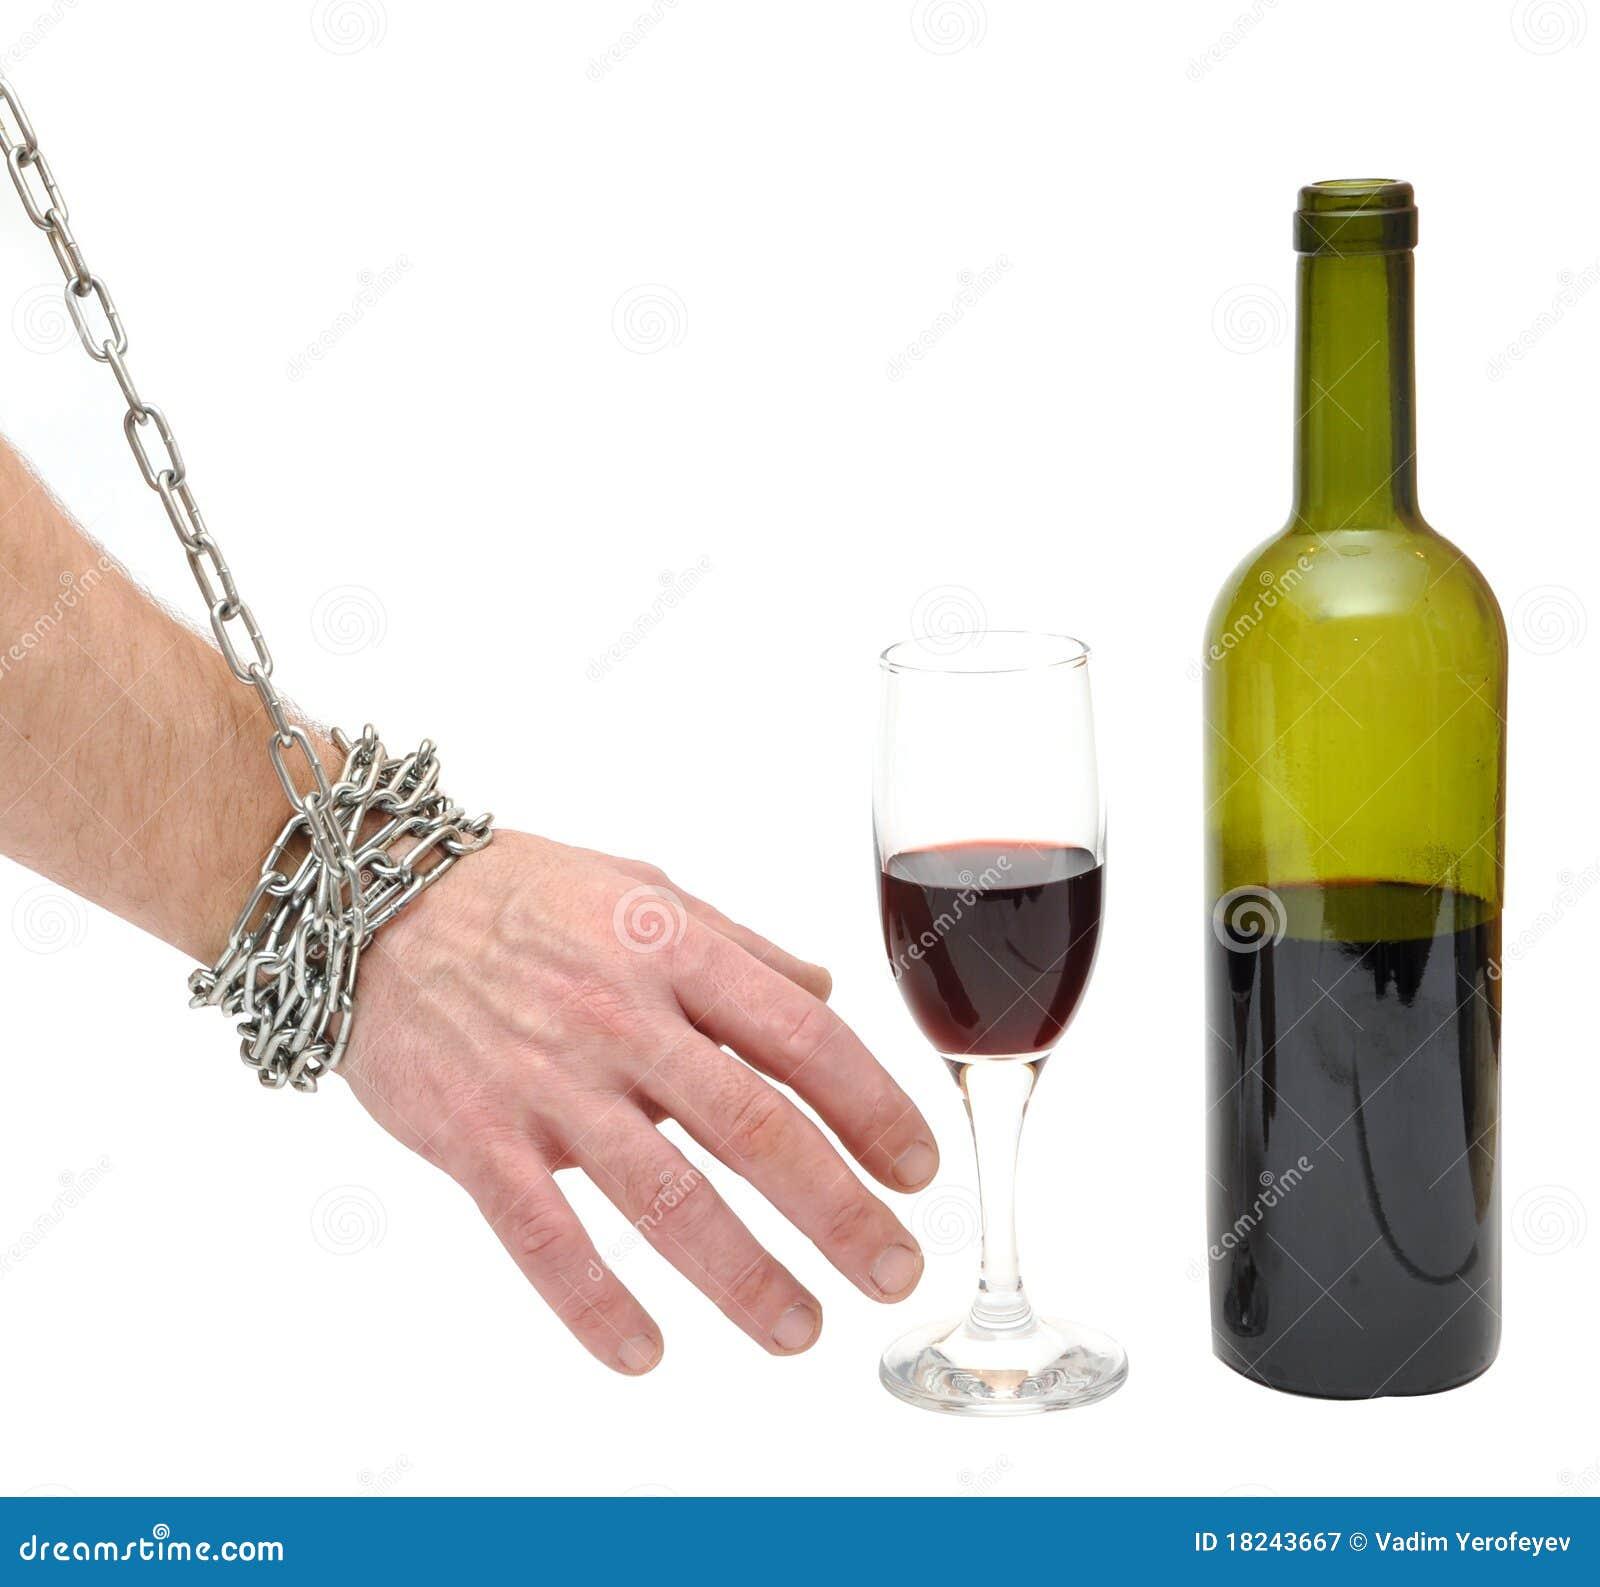 stop-alcoholism-concept-18243667.jpg